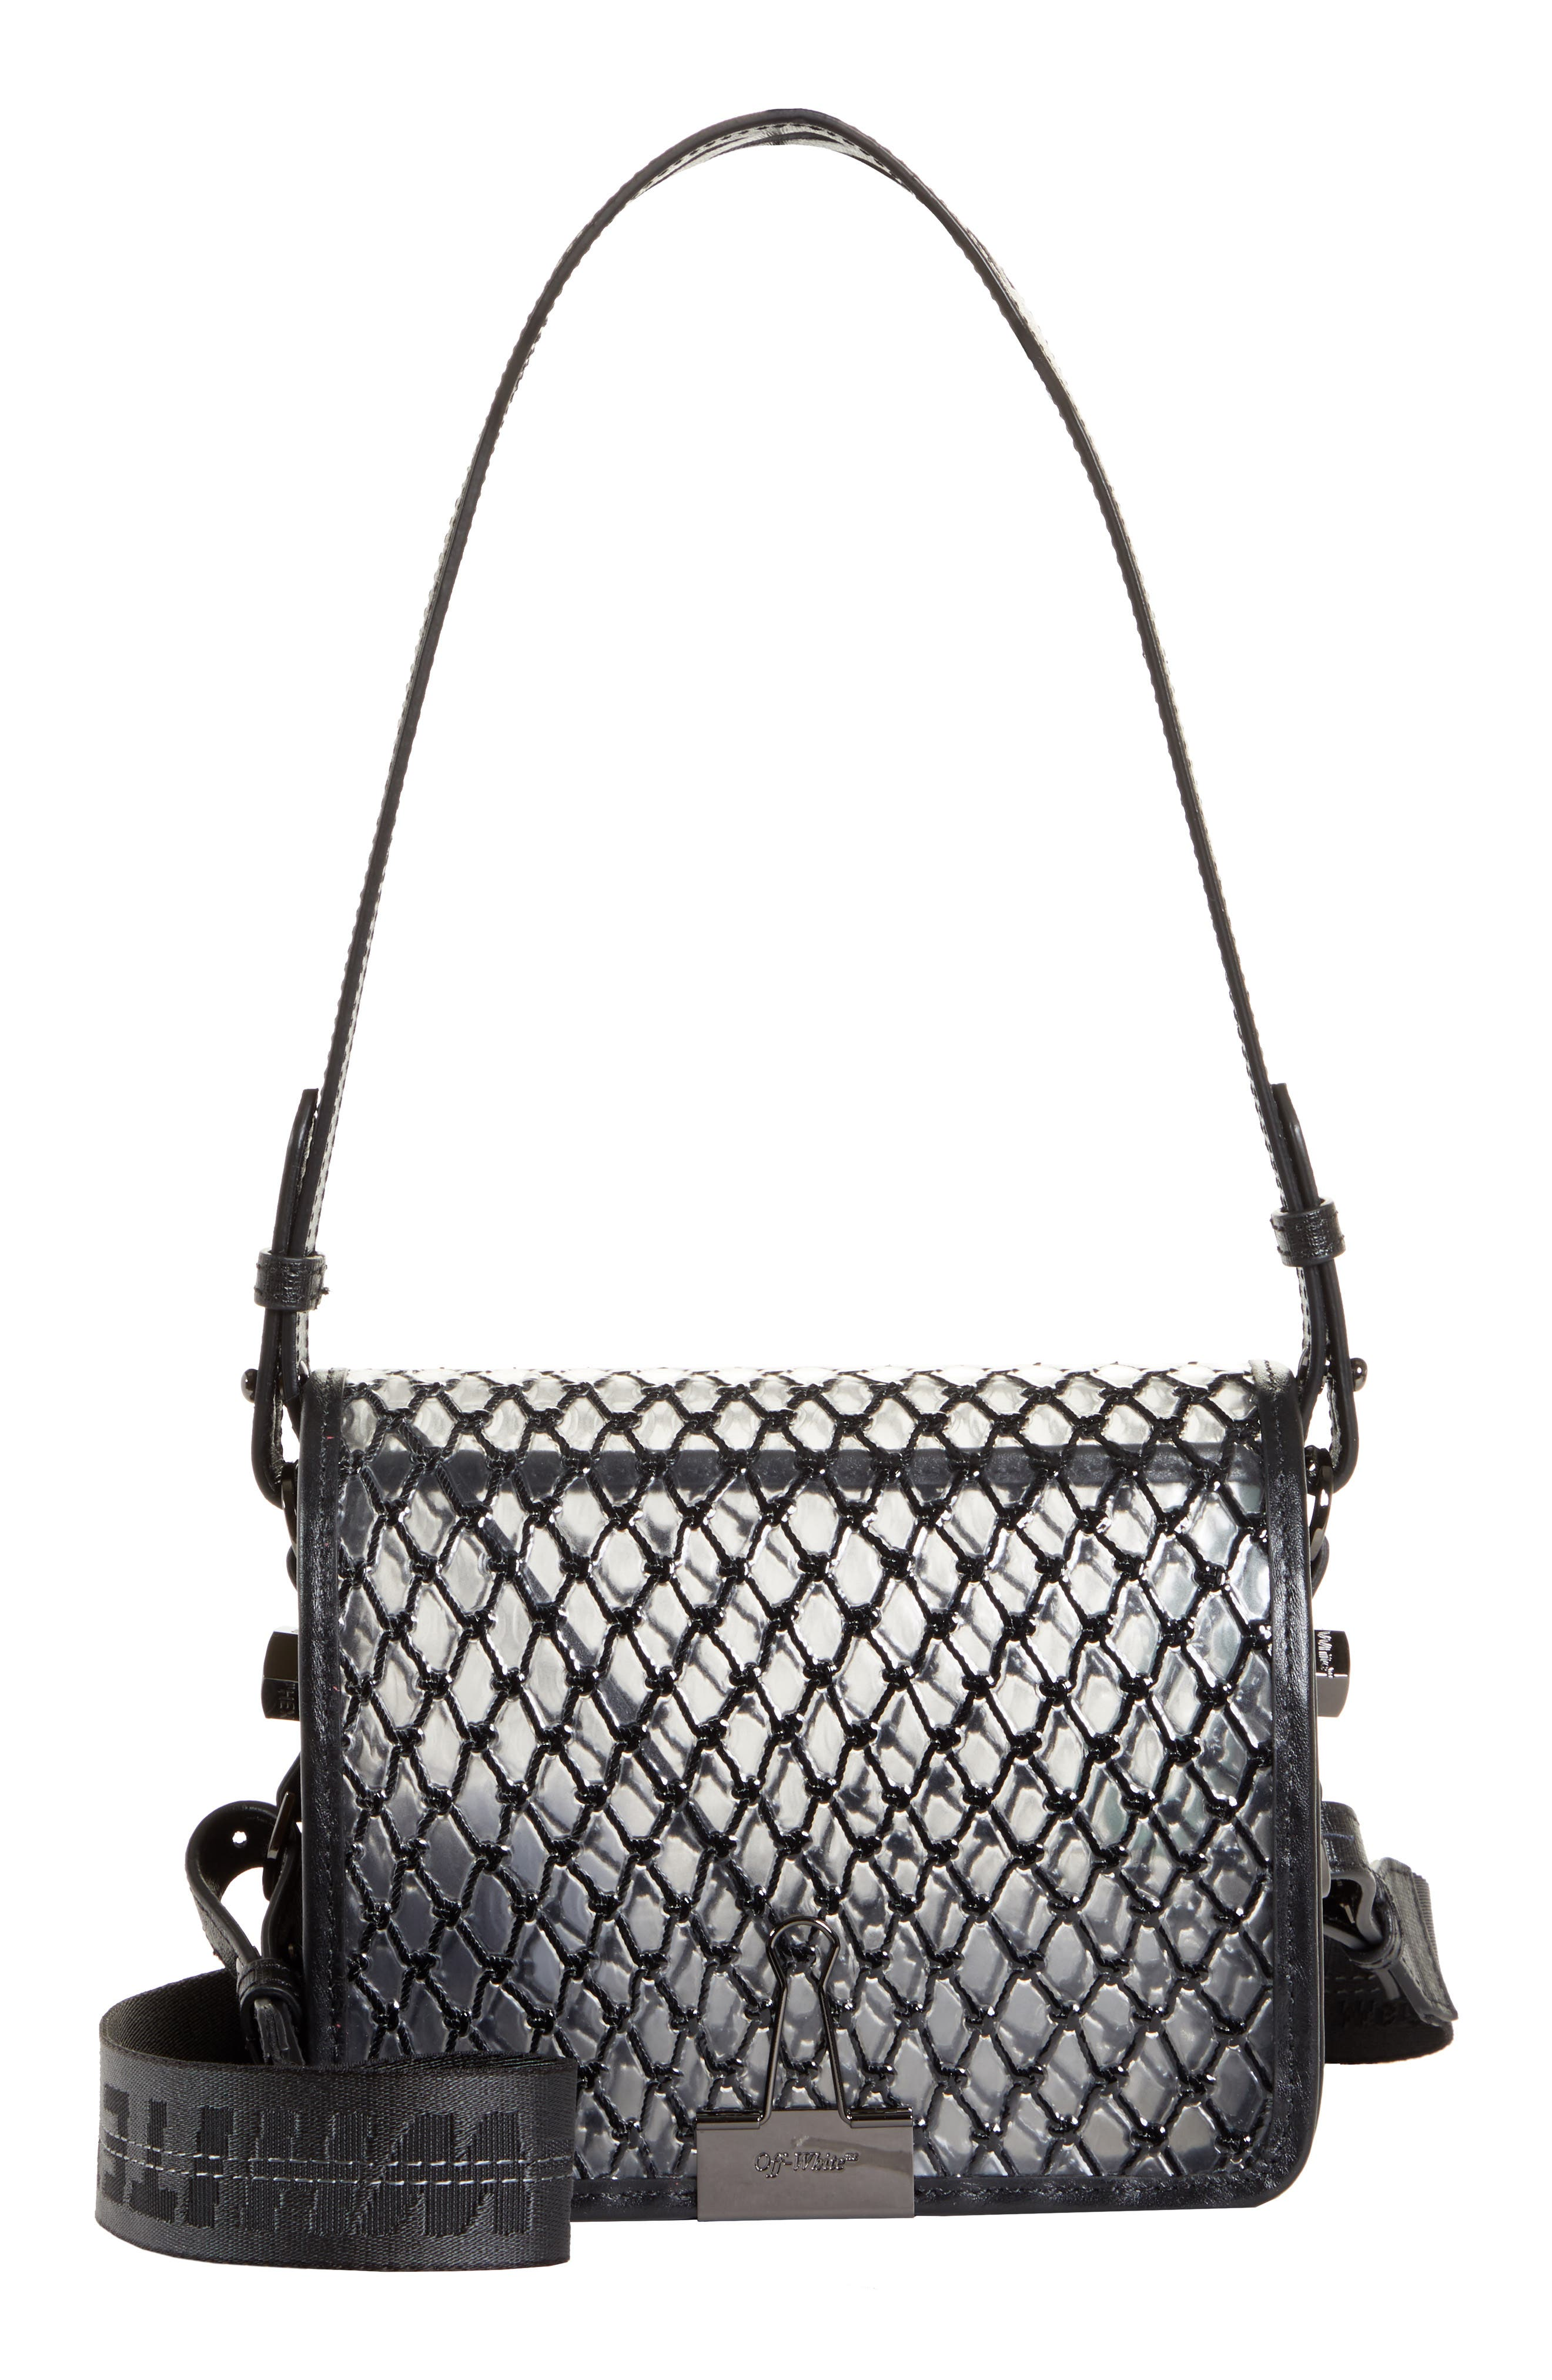 OFF-WHITE, Net PVC Flap Bag, Main thumbnail 1, color, BLACK